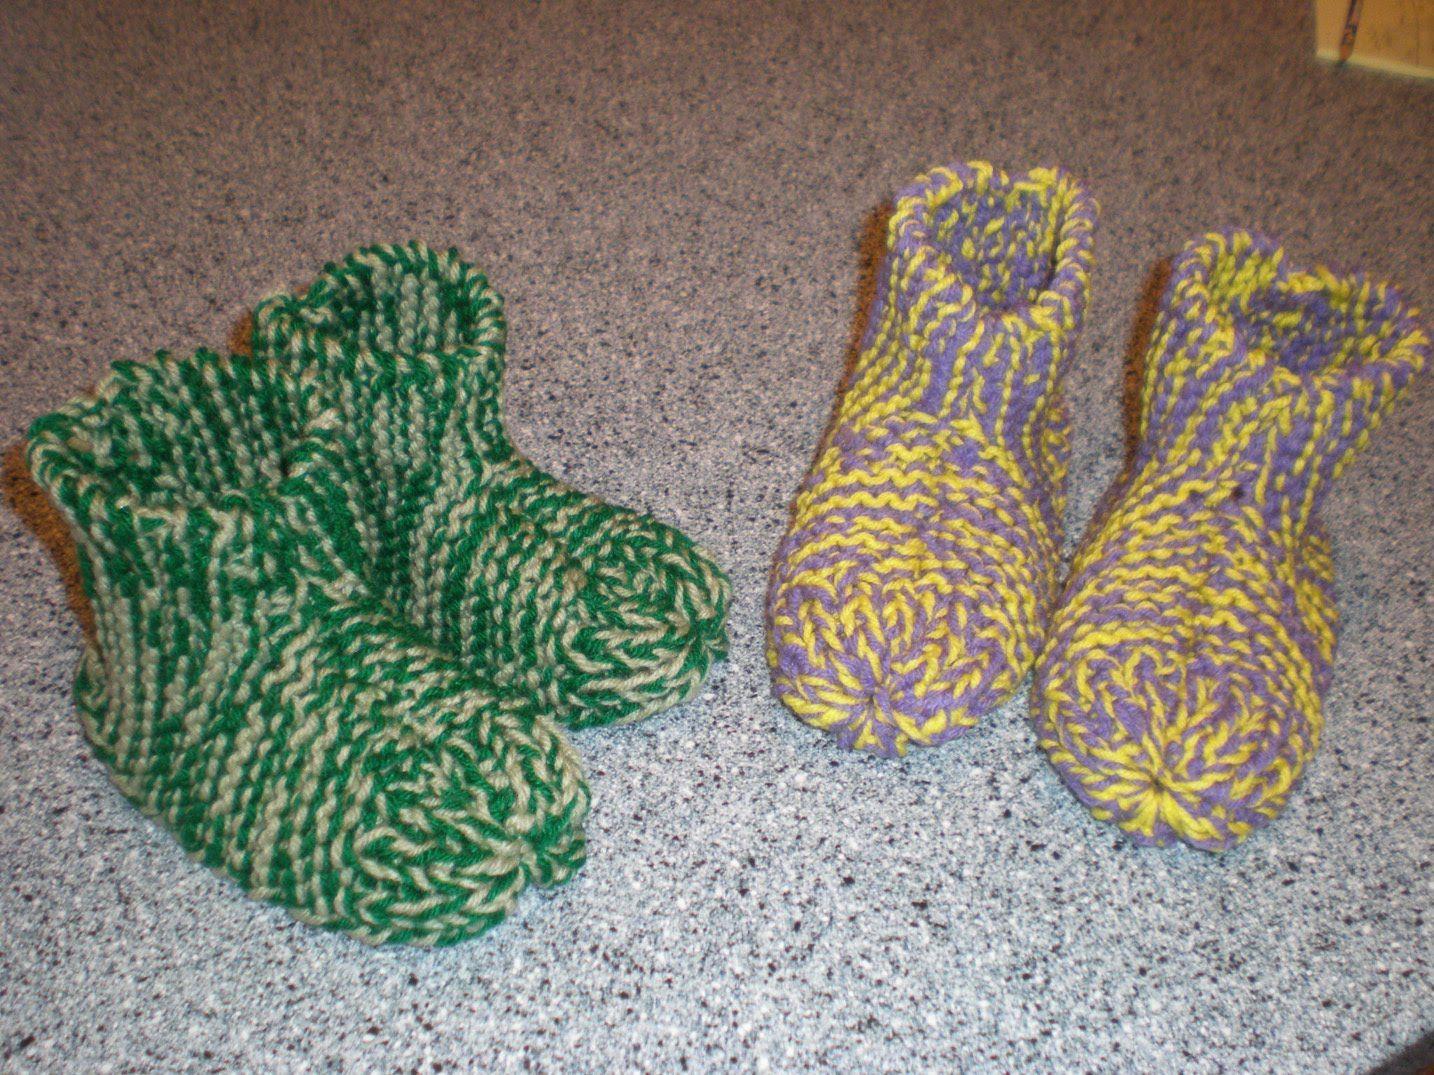 Adirondacks slipper socks knitting pattern red heart knitting adirondacks slipper socks knitting pattern red heart bankloansurffo Image collections